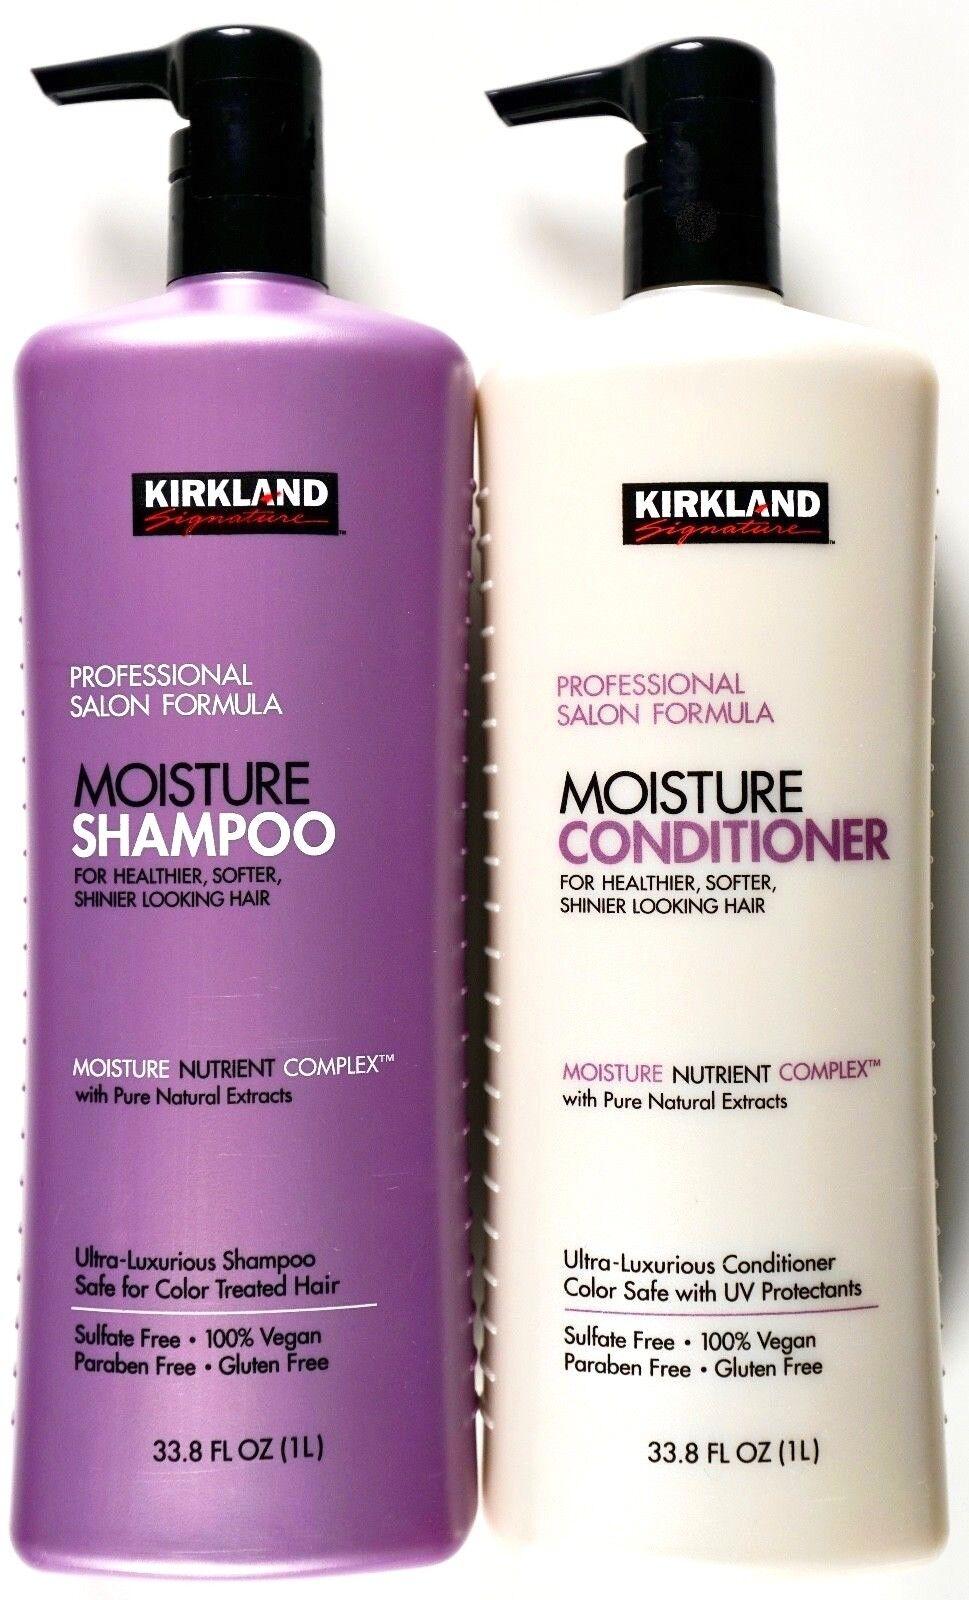 Kirkland Signature Professional Salon Moisture Shampoo or Co